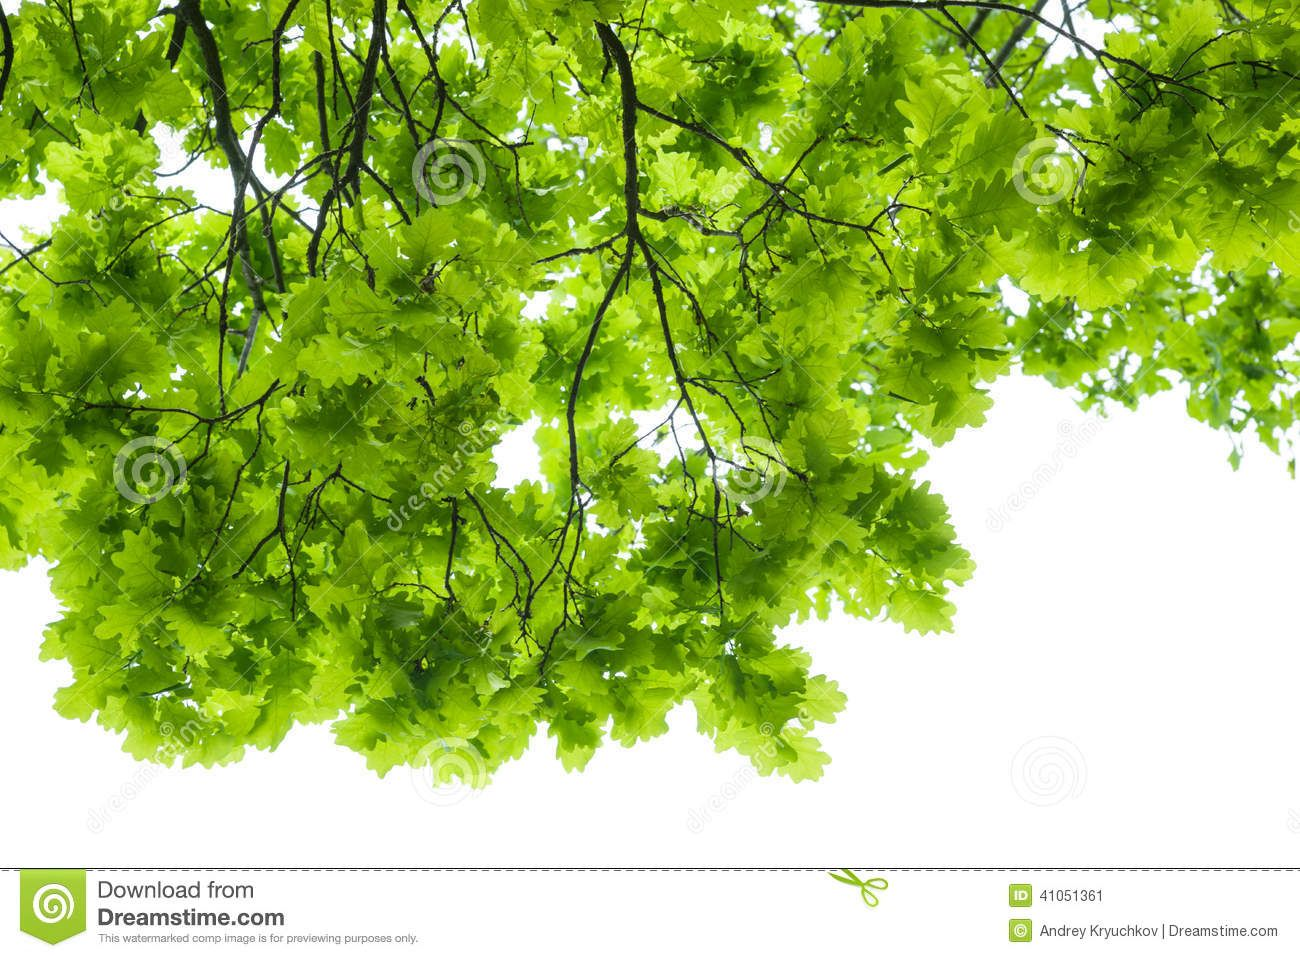 thumbs.dreamstime.com z oak-tree-leaves-isolated-white-41051361.jpg